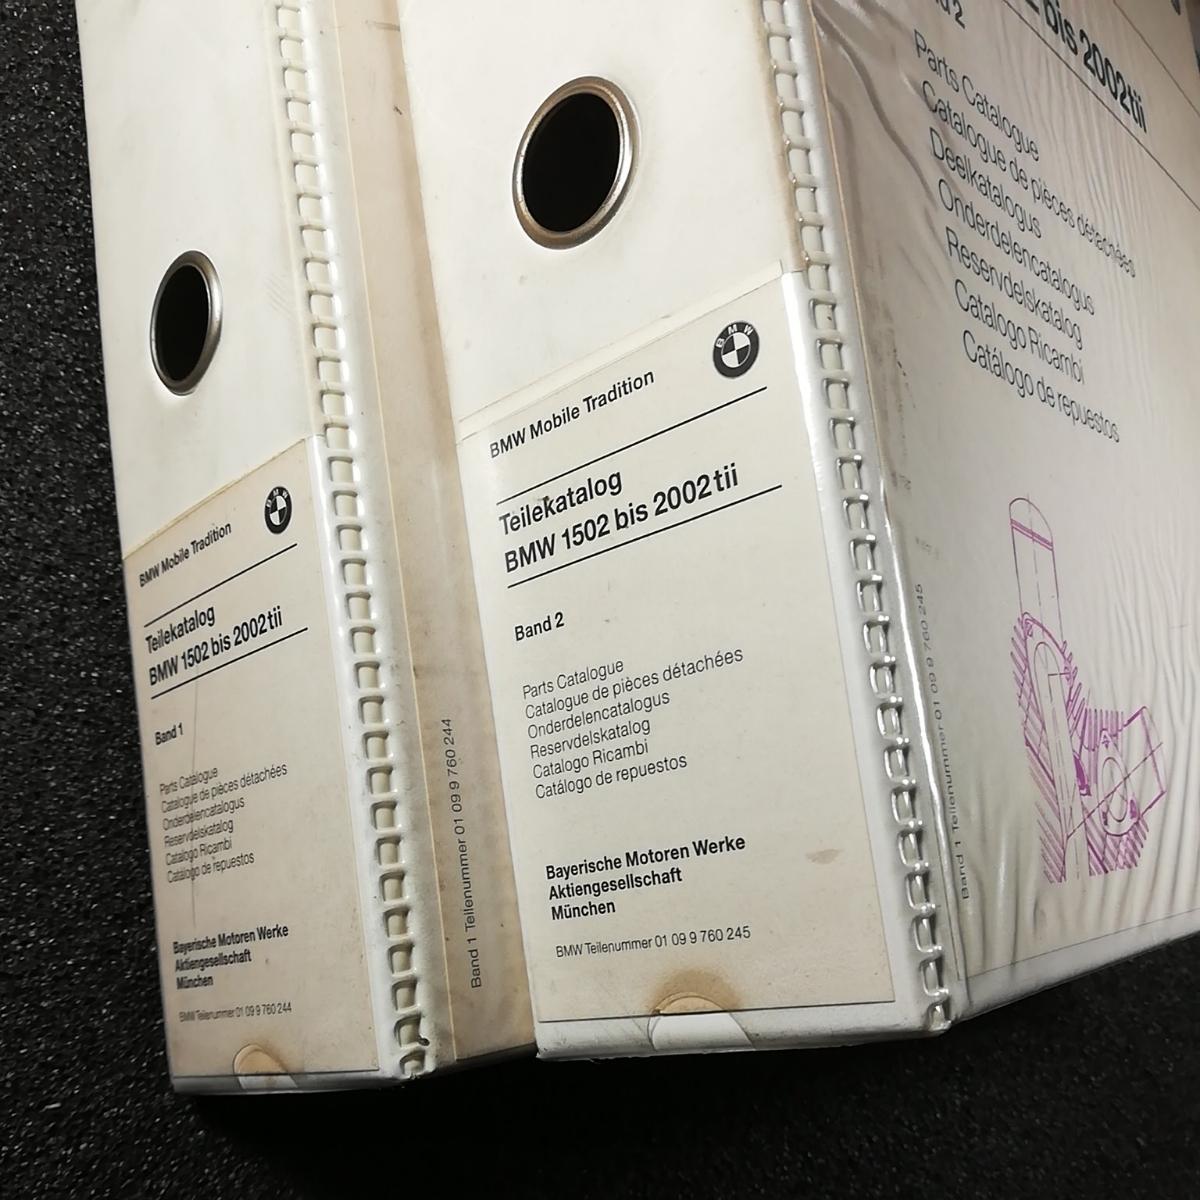 BMW Marni 1502 1600 2002 ti tii 2002 turbo parts list rare super rare large binder -2 pcs. set